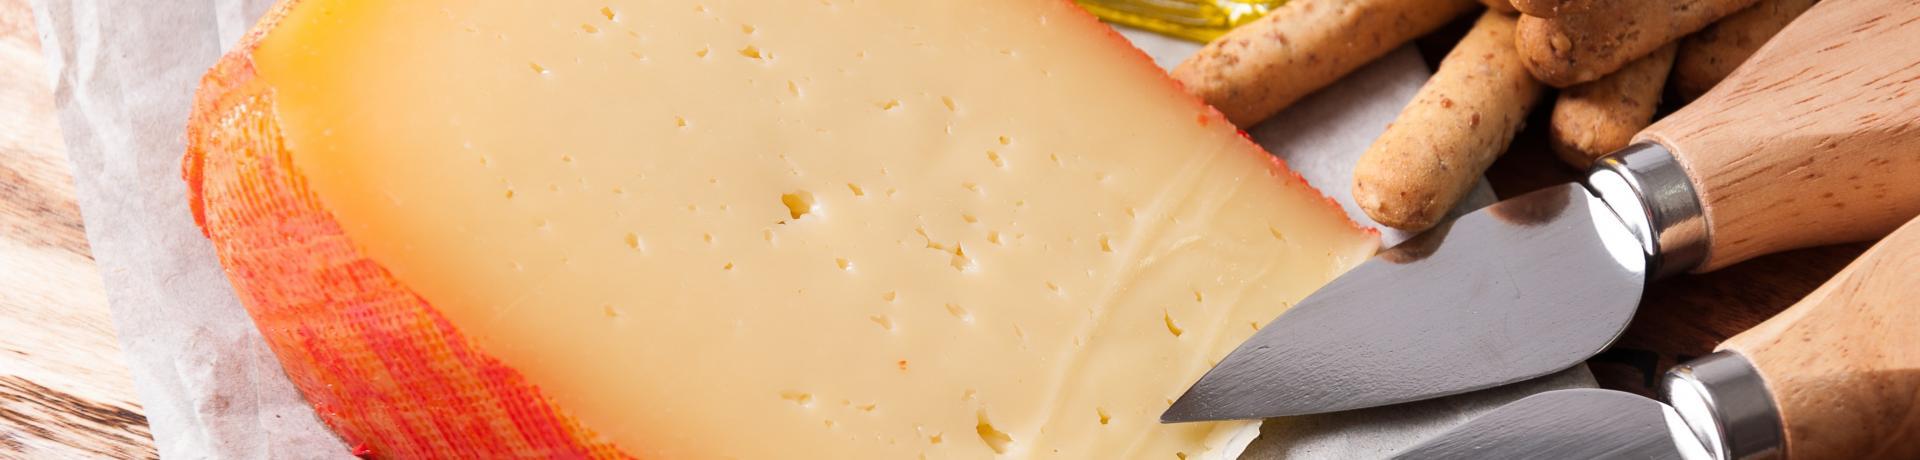 Essen+Käse+Balearen+GI-495356820.jpg